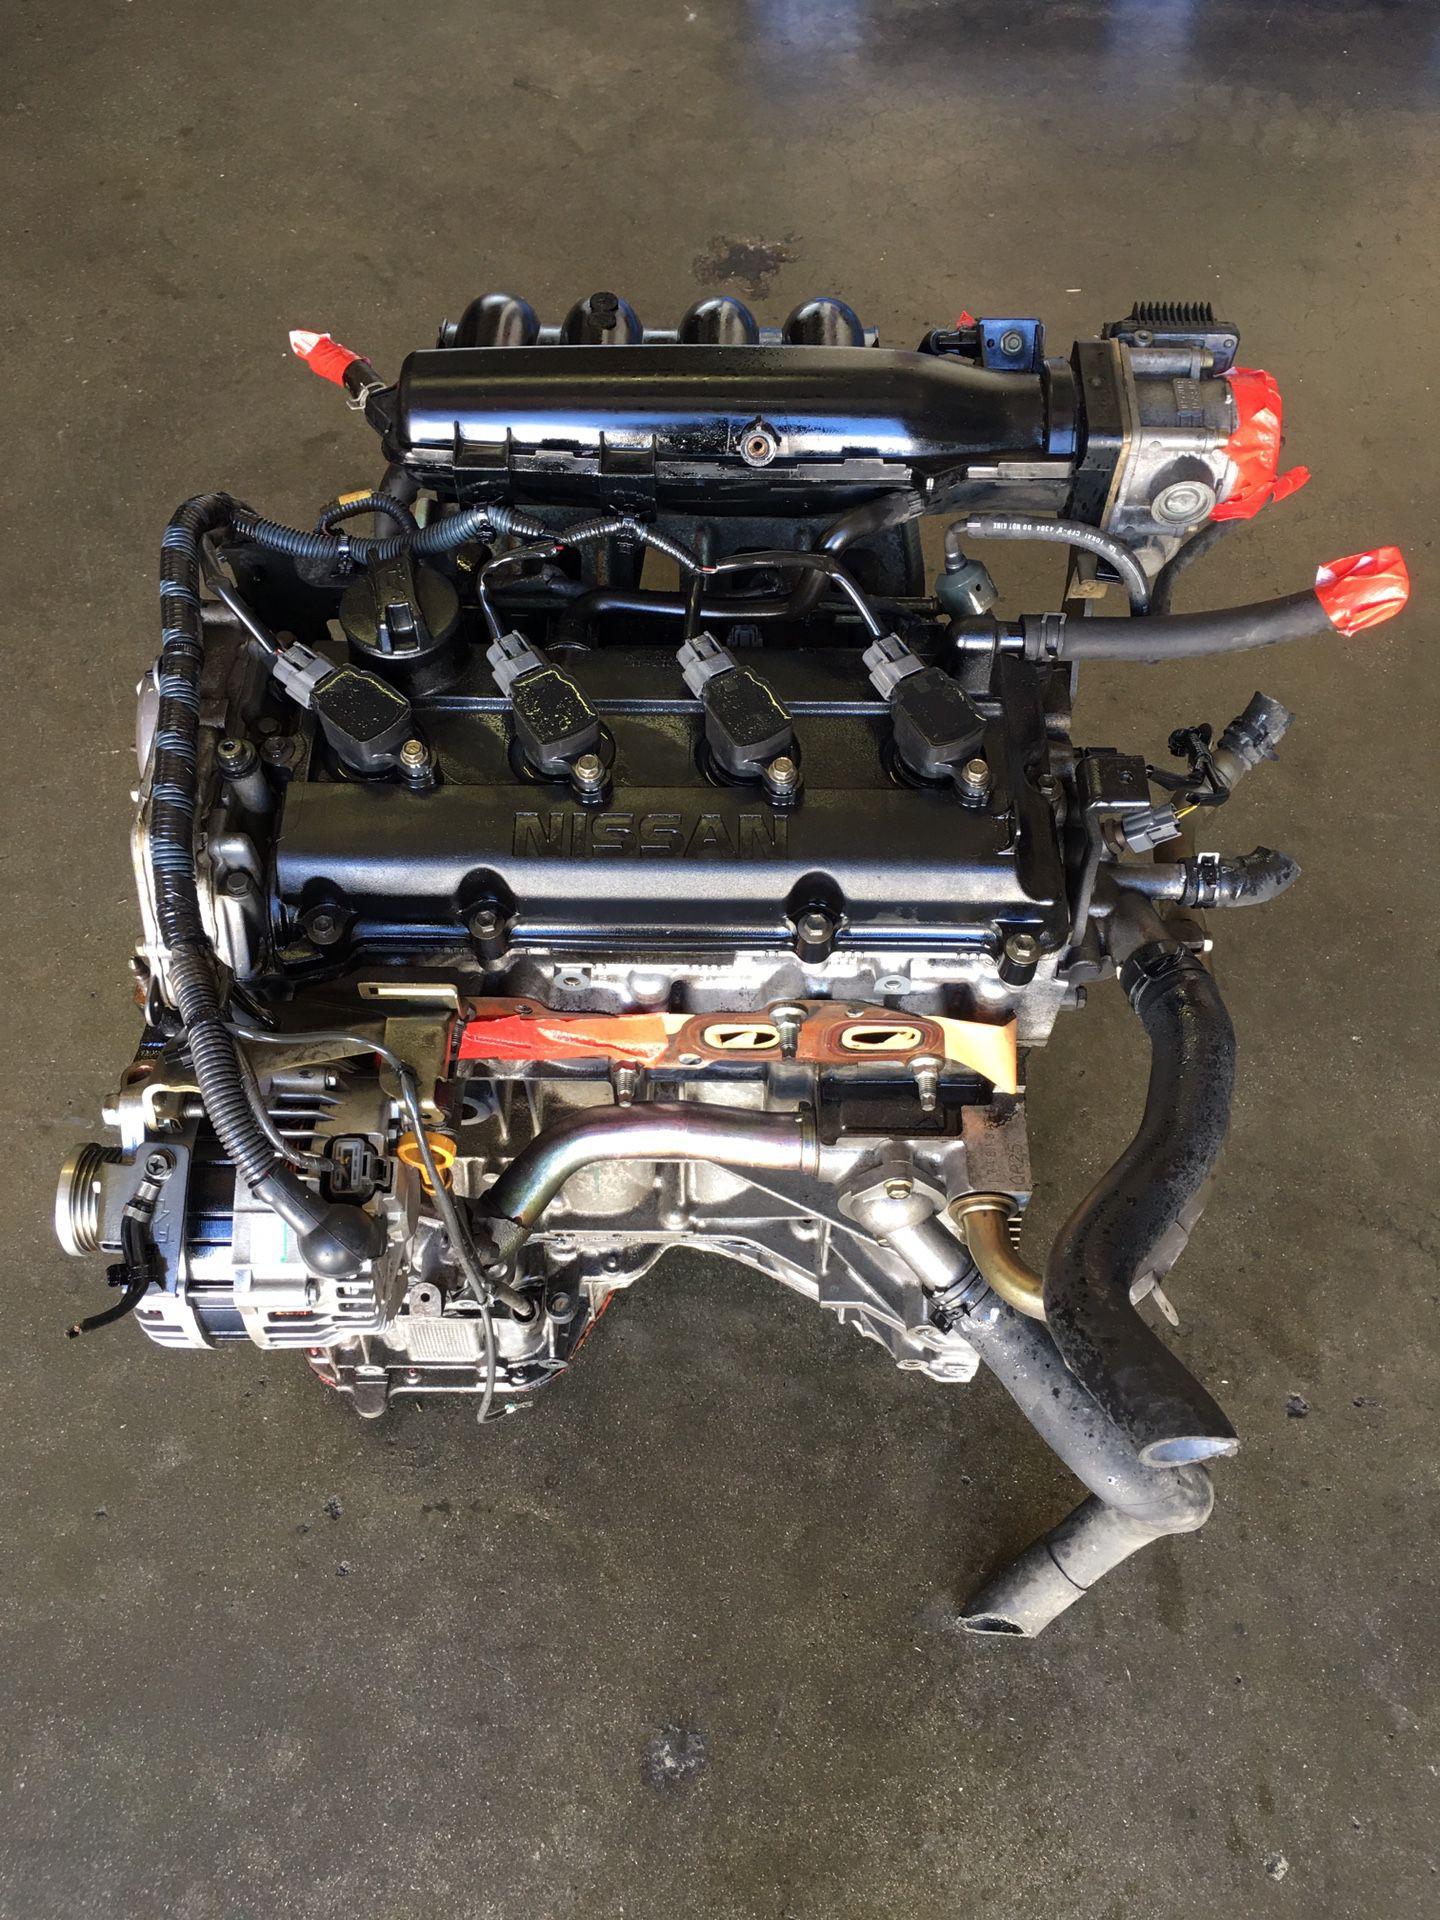 Nissan Altima 2002-2005 engine 2.5L QR25 Motor genuine low miles